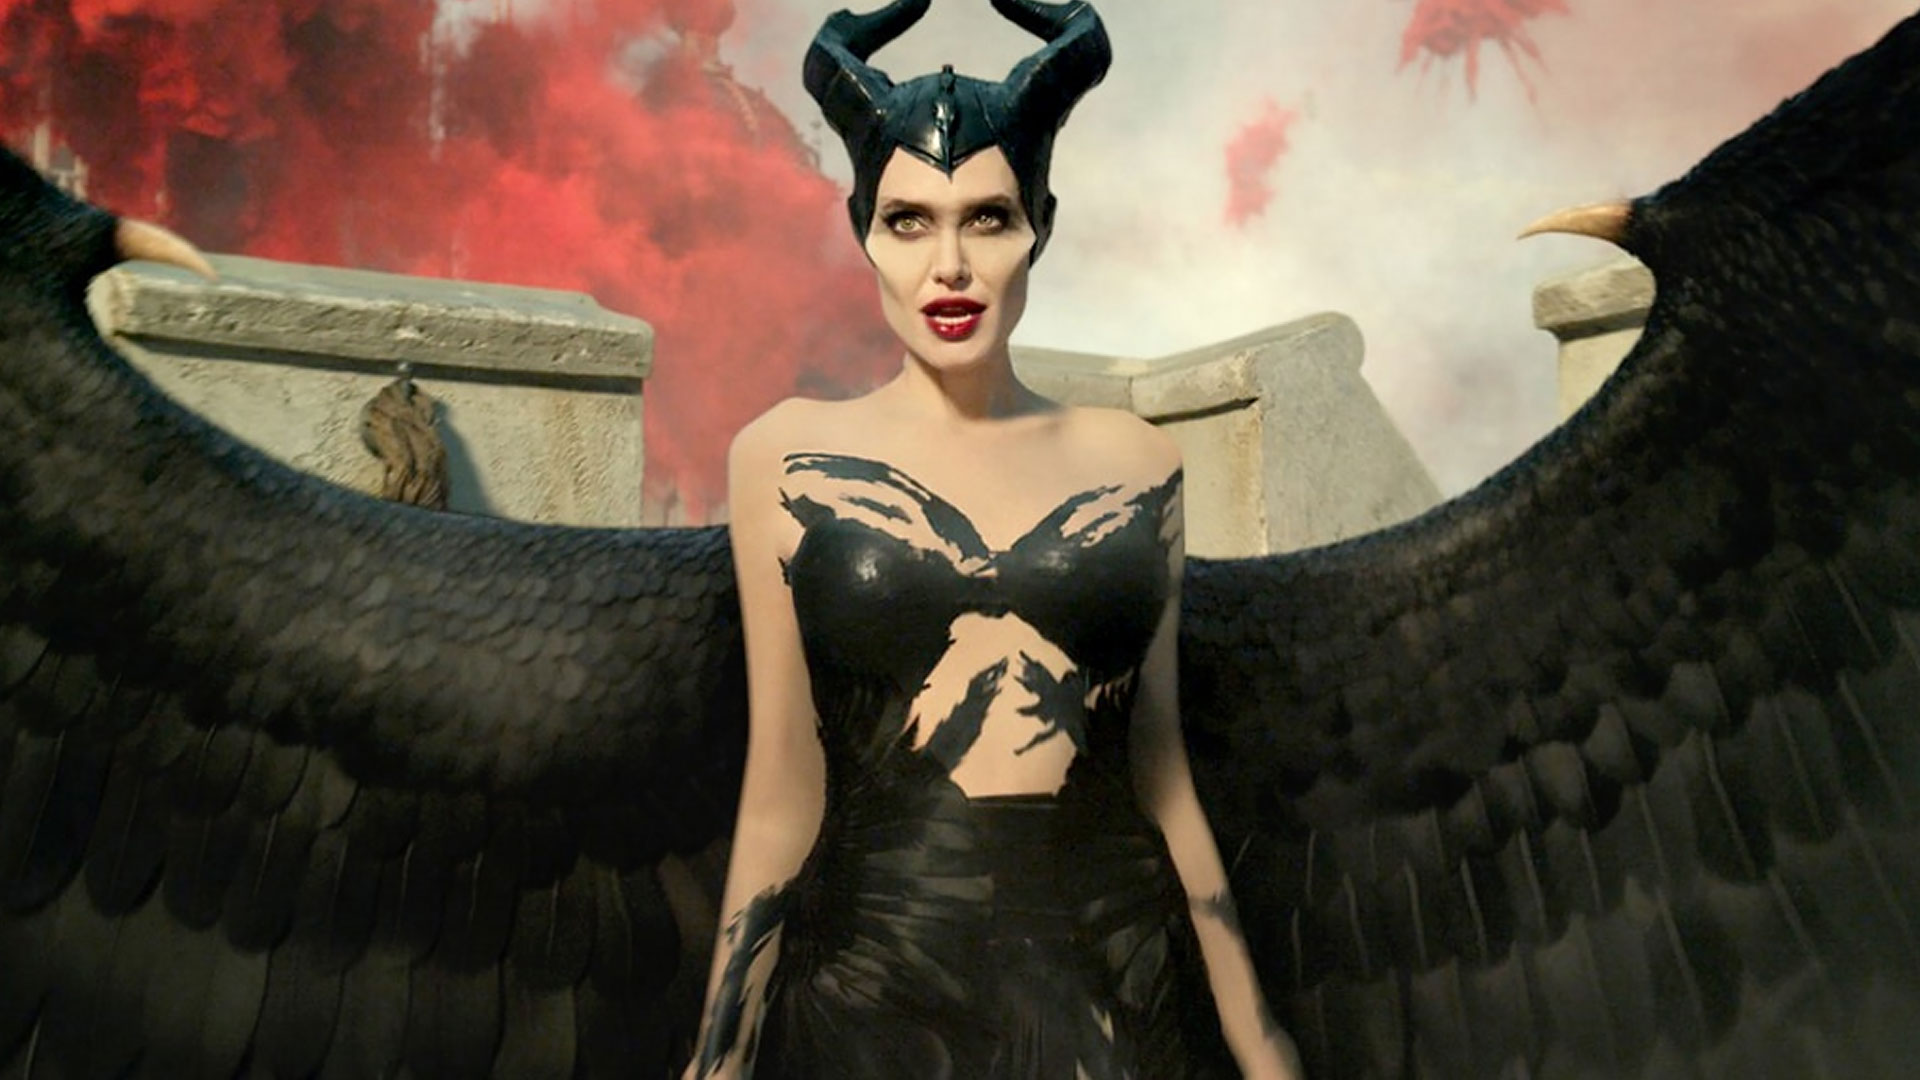 2020oscardeathrace Maleficent Mistress Of Evil 2019 Goat Film Reviews